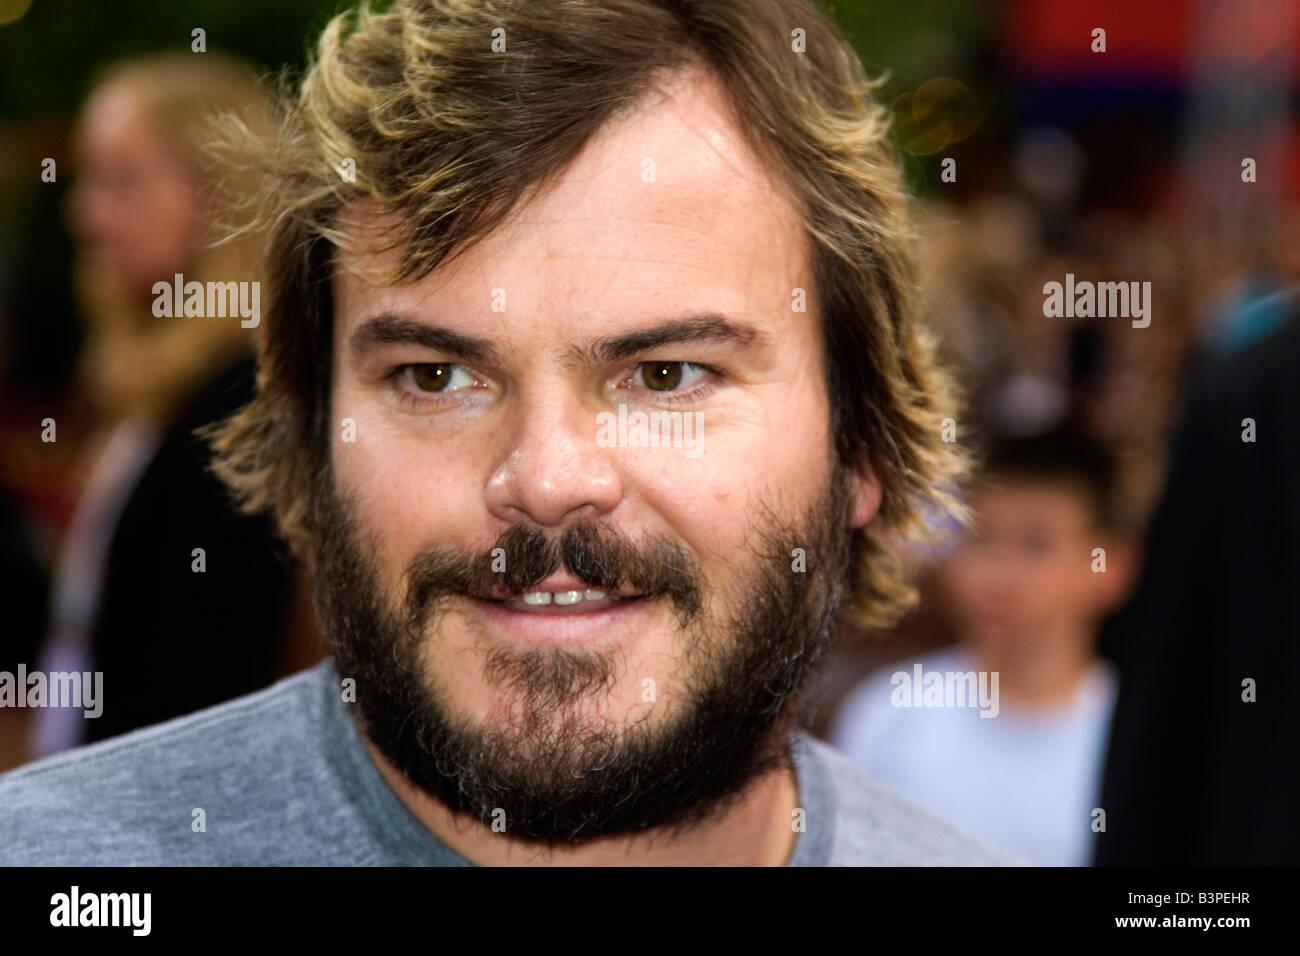 American Actor Singers Stock Photos & American Actor Singers Stock ...